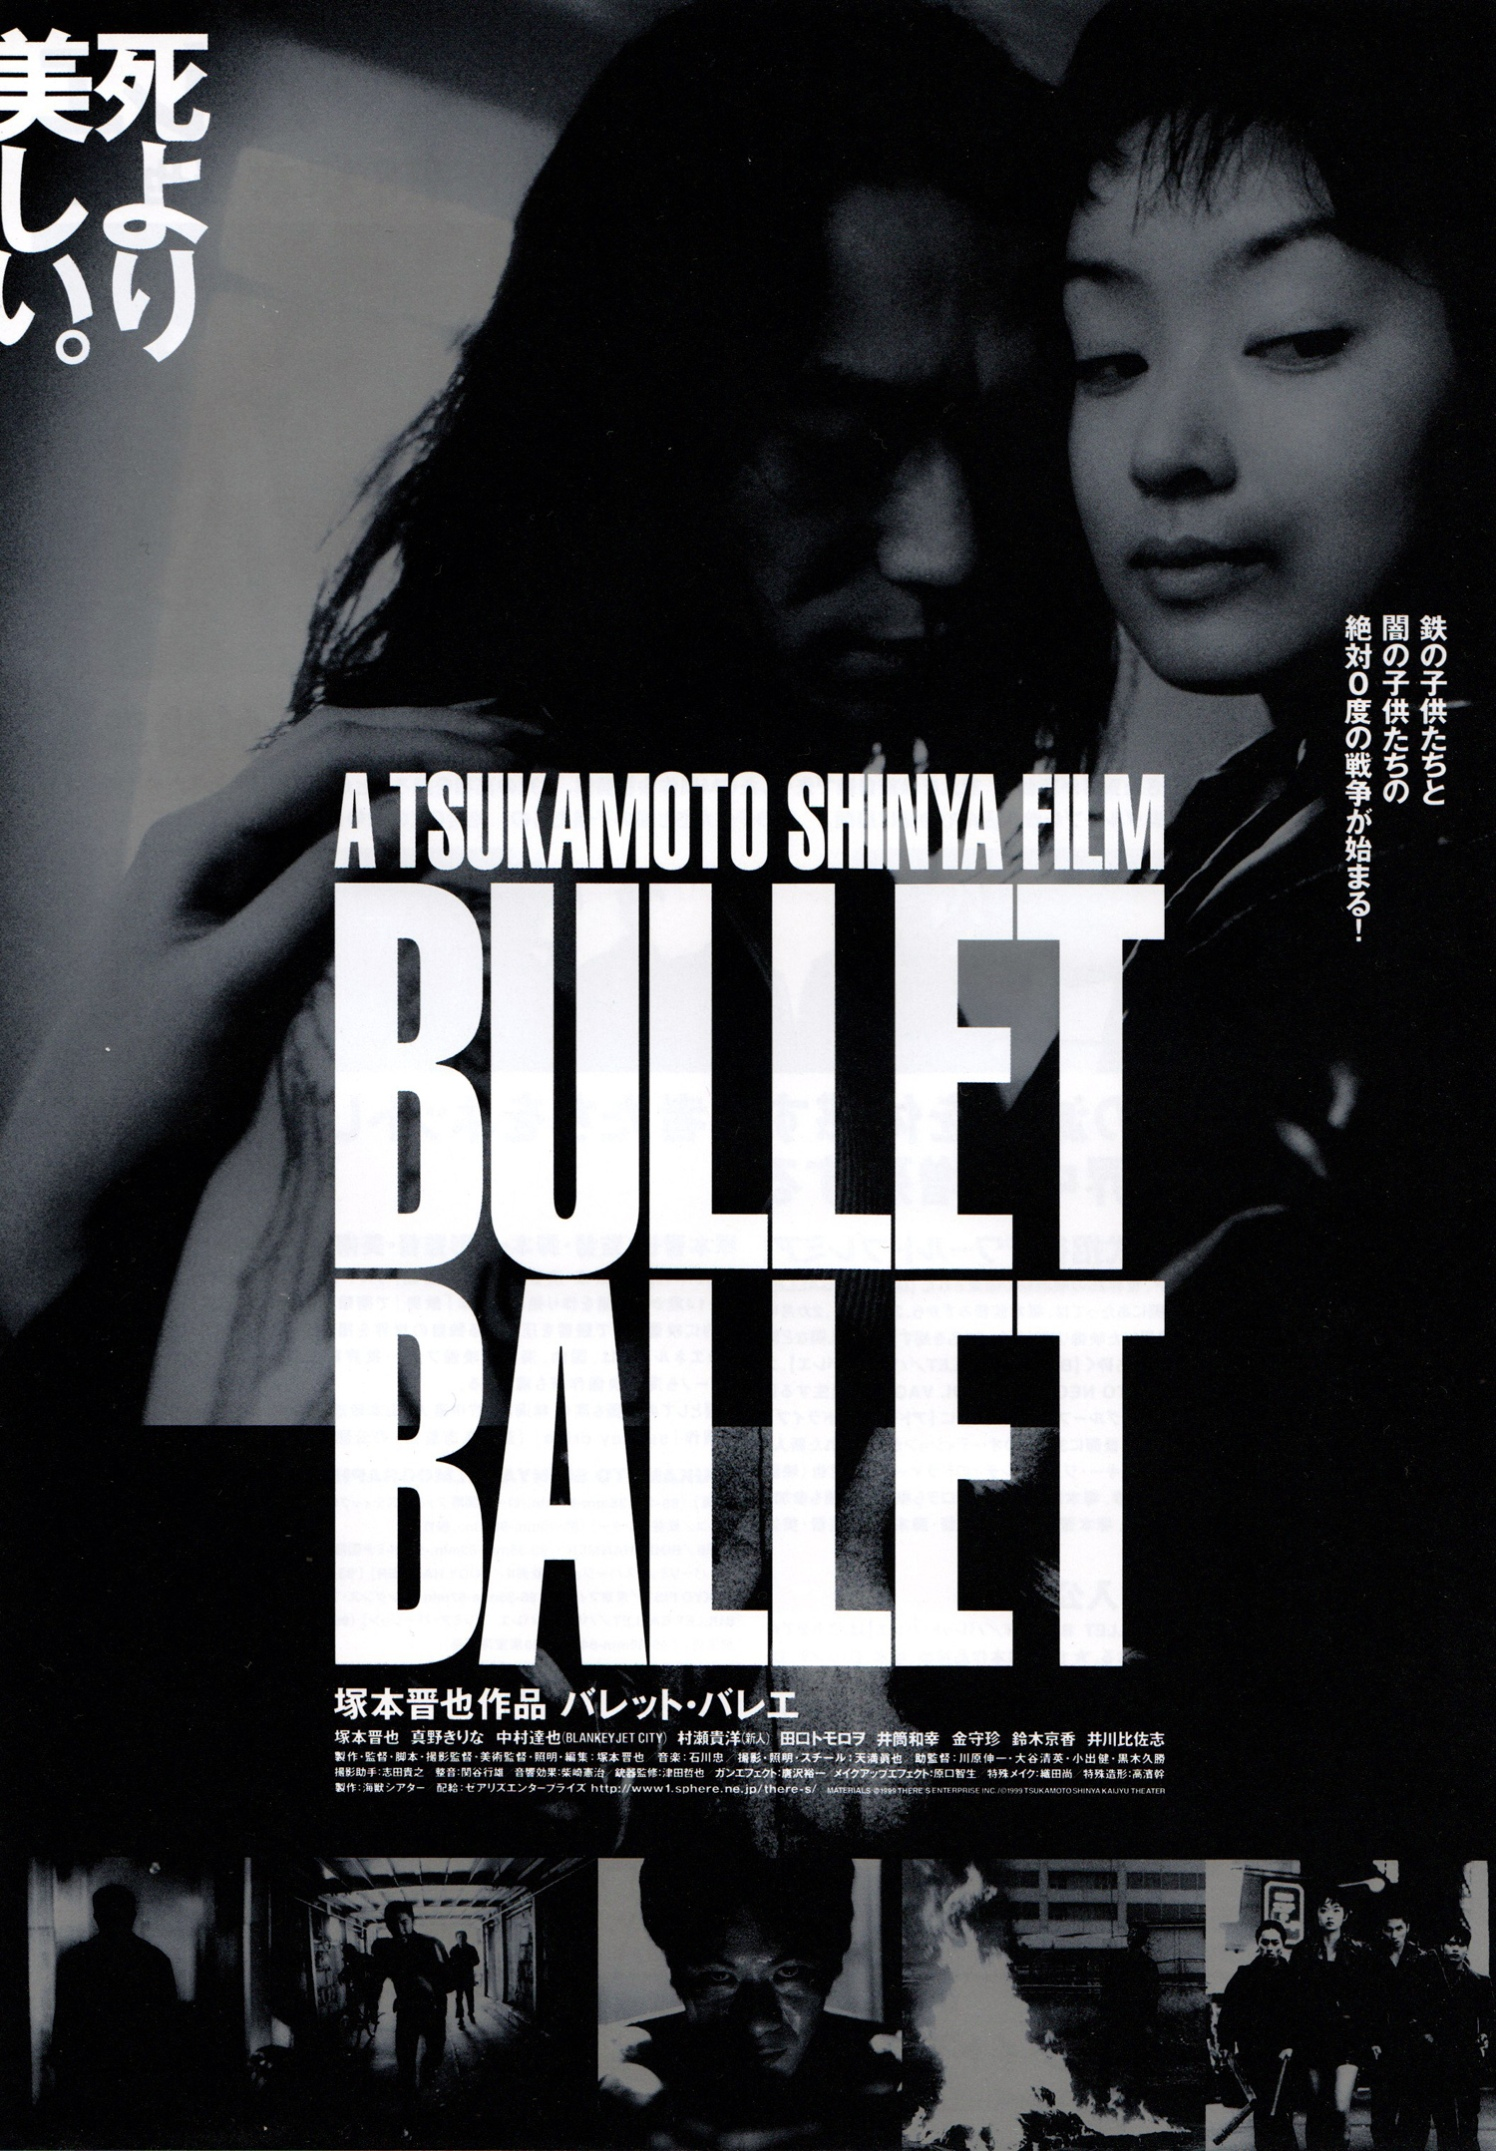 bulletballet_japan-1